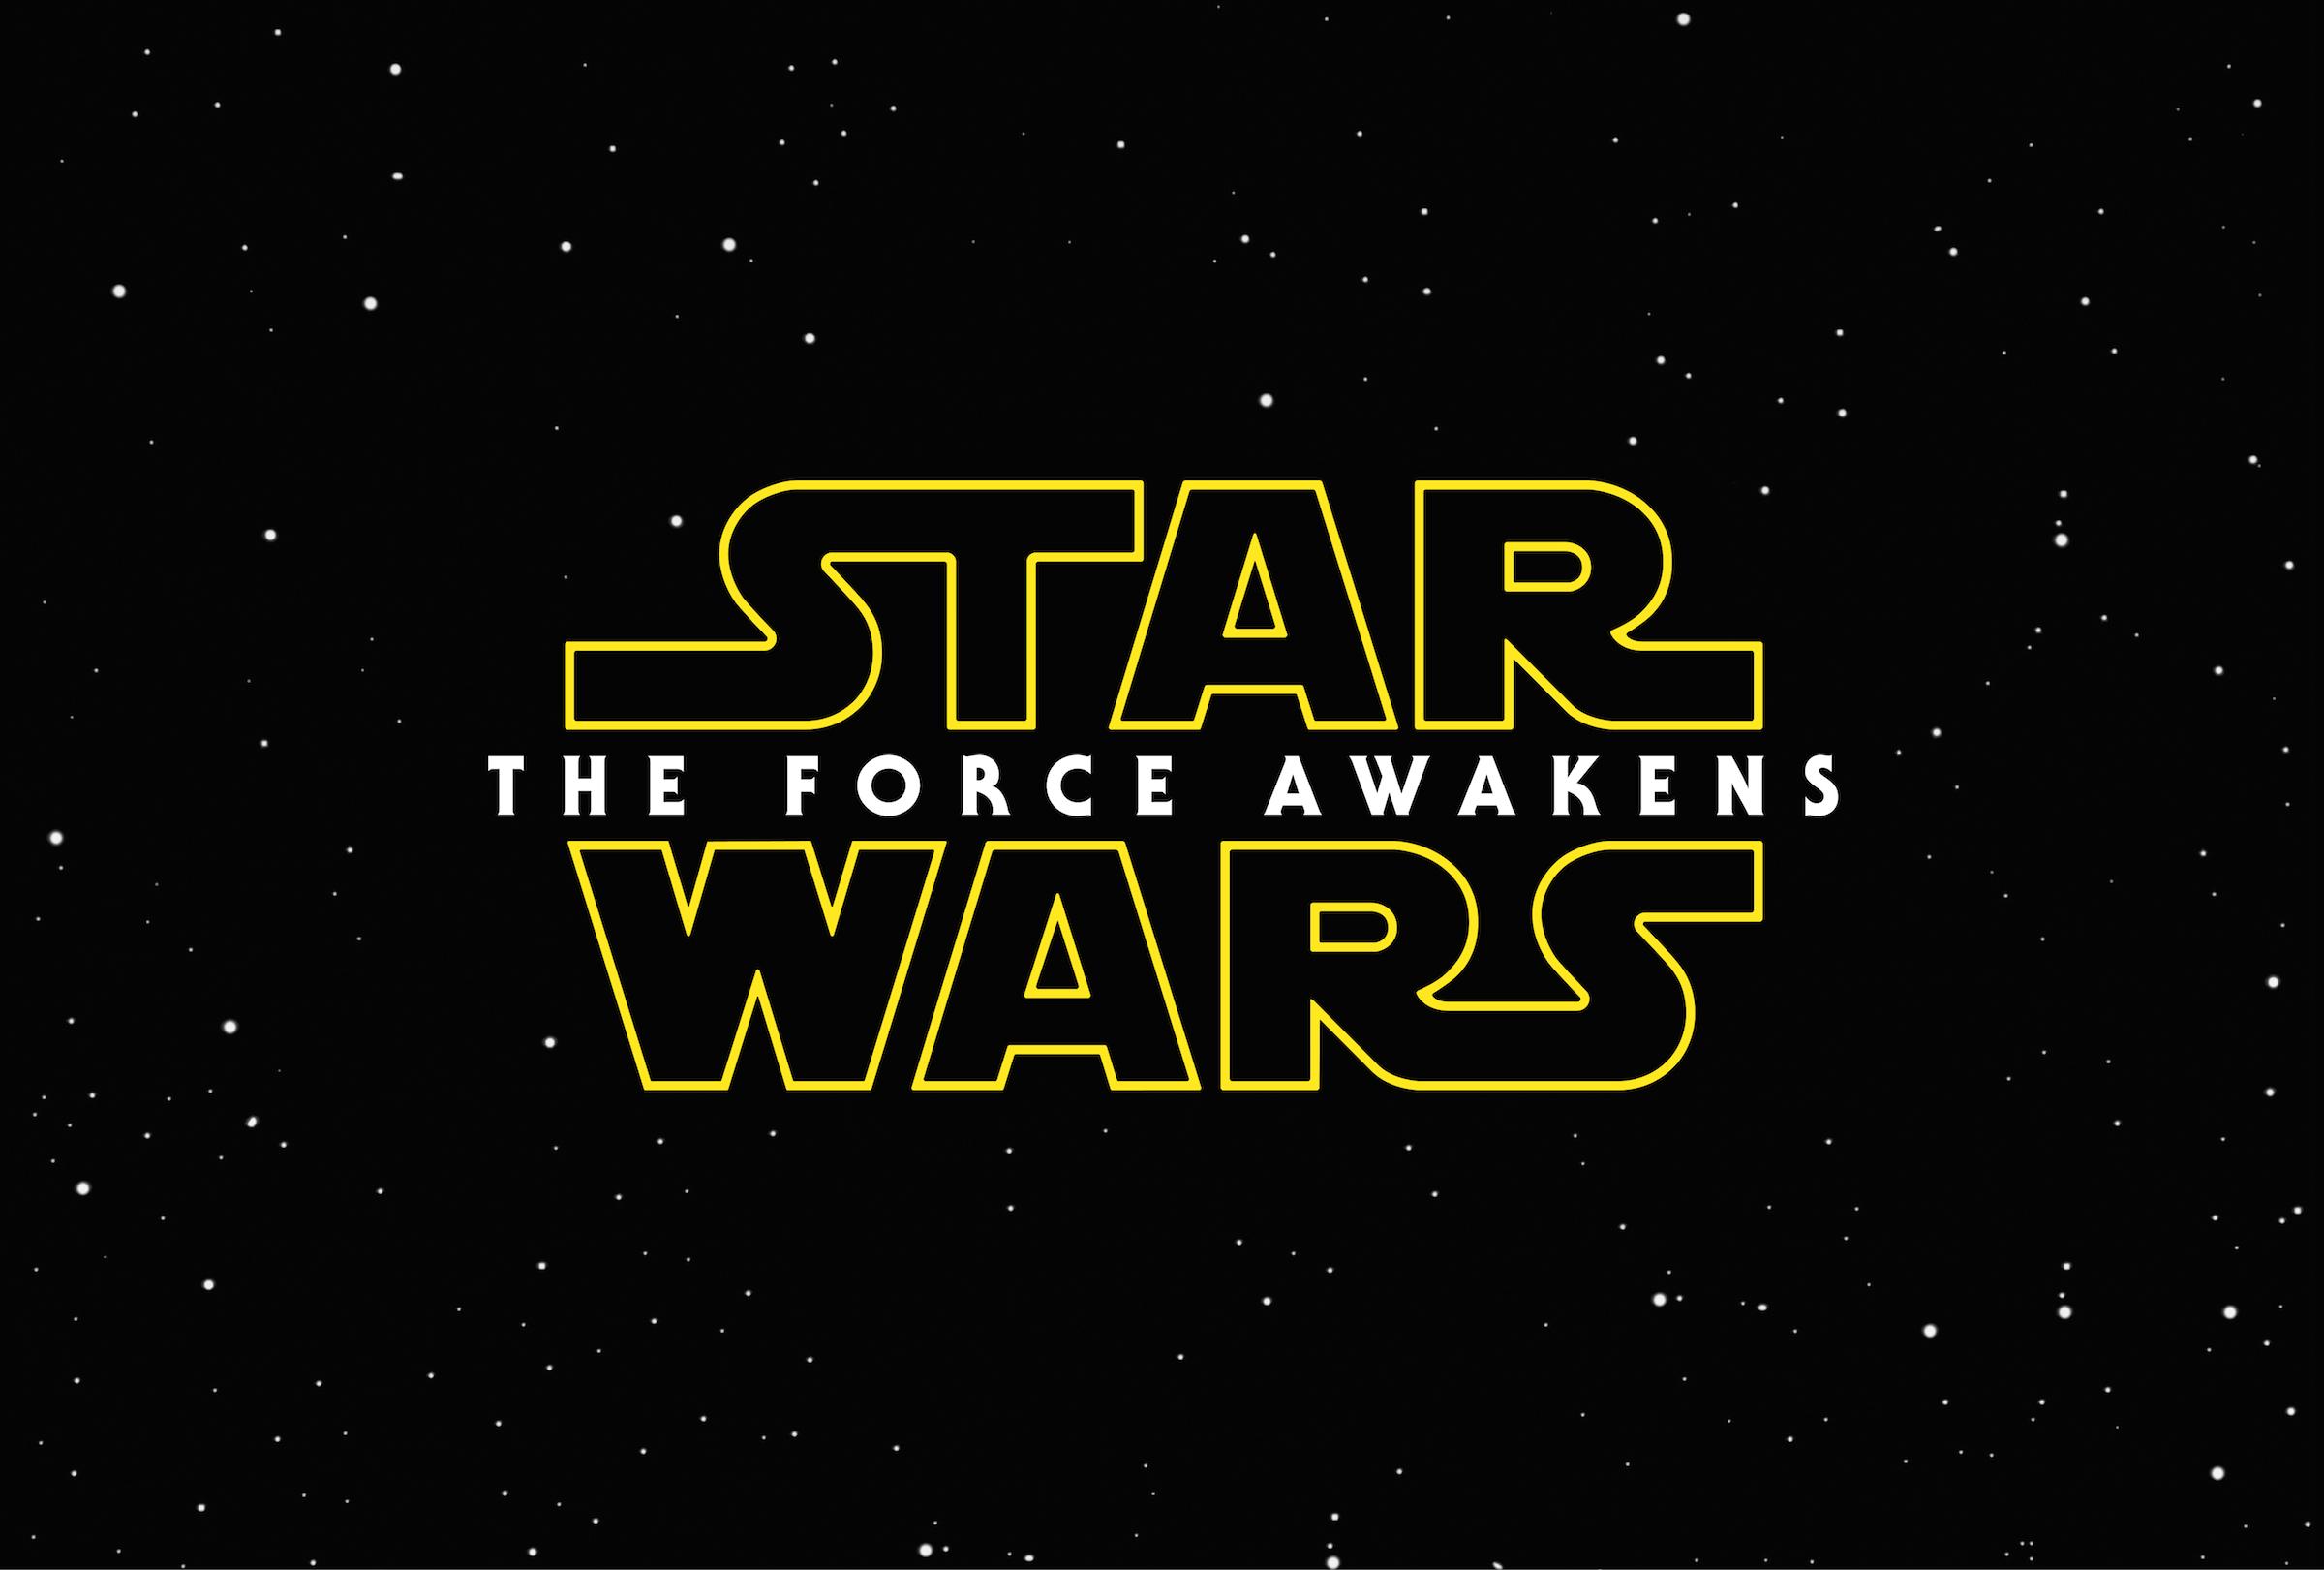 Star Wars 7 poster